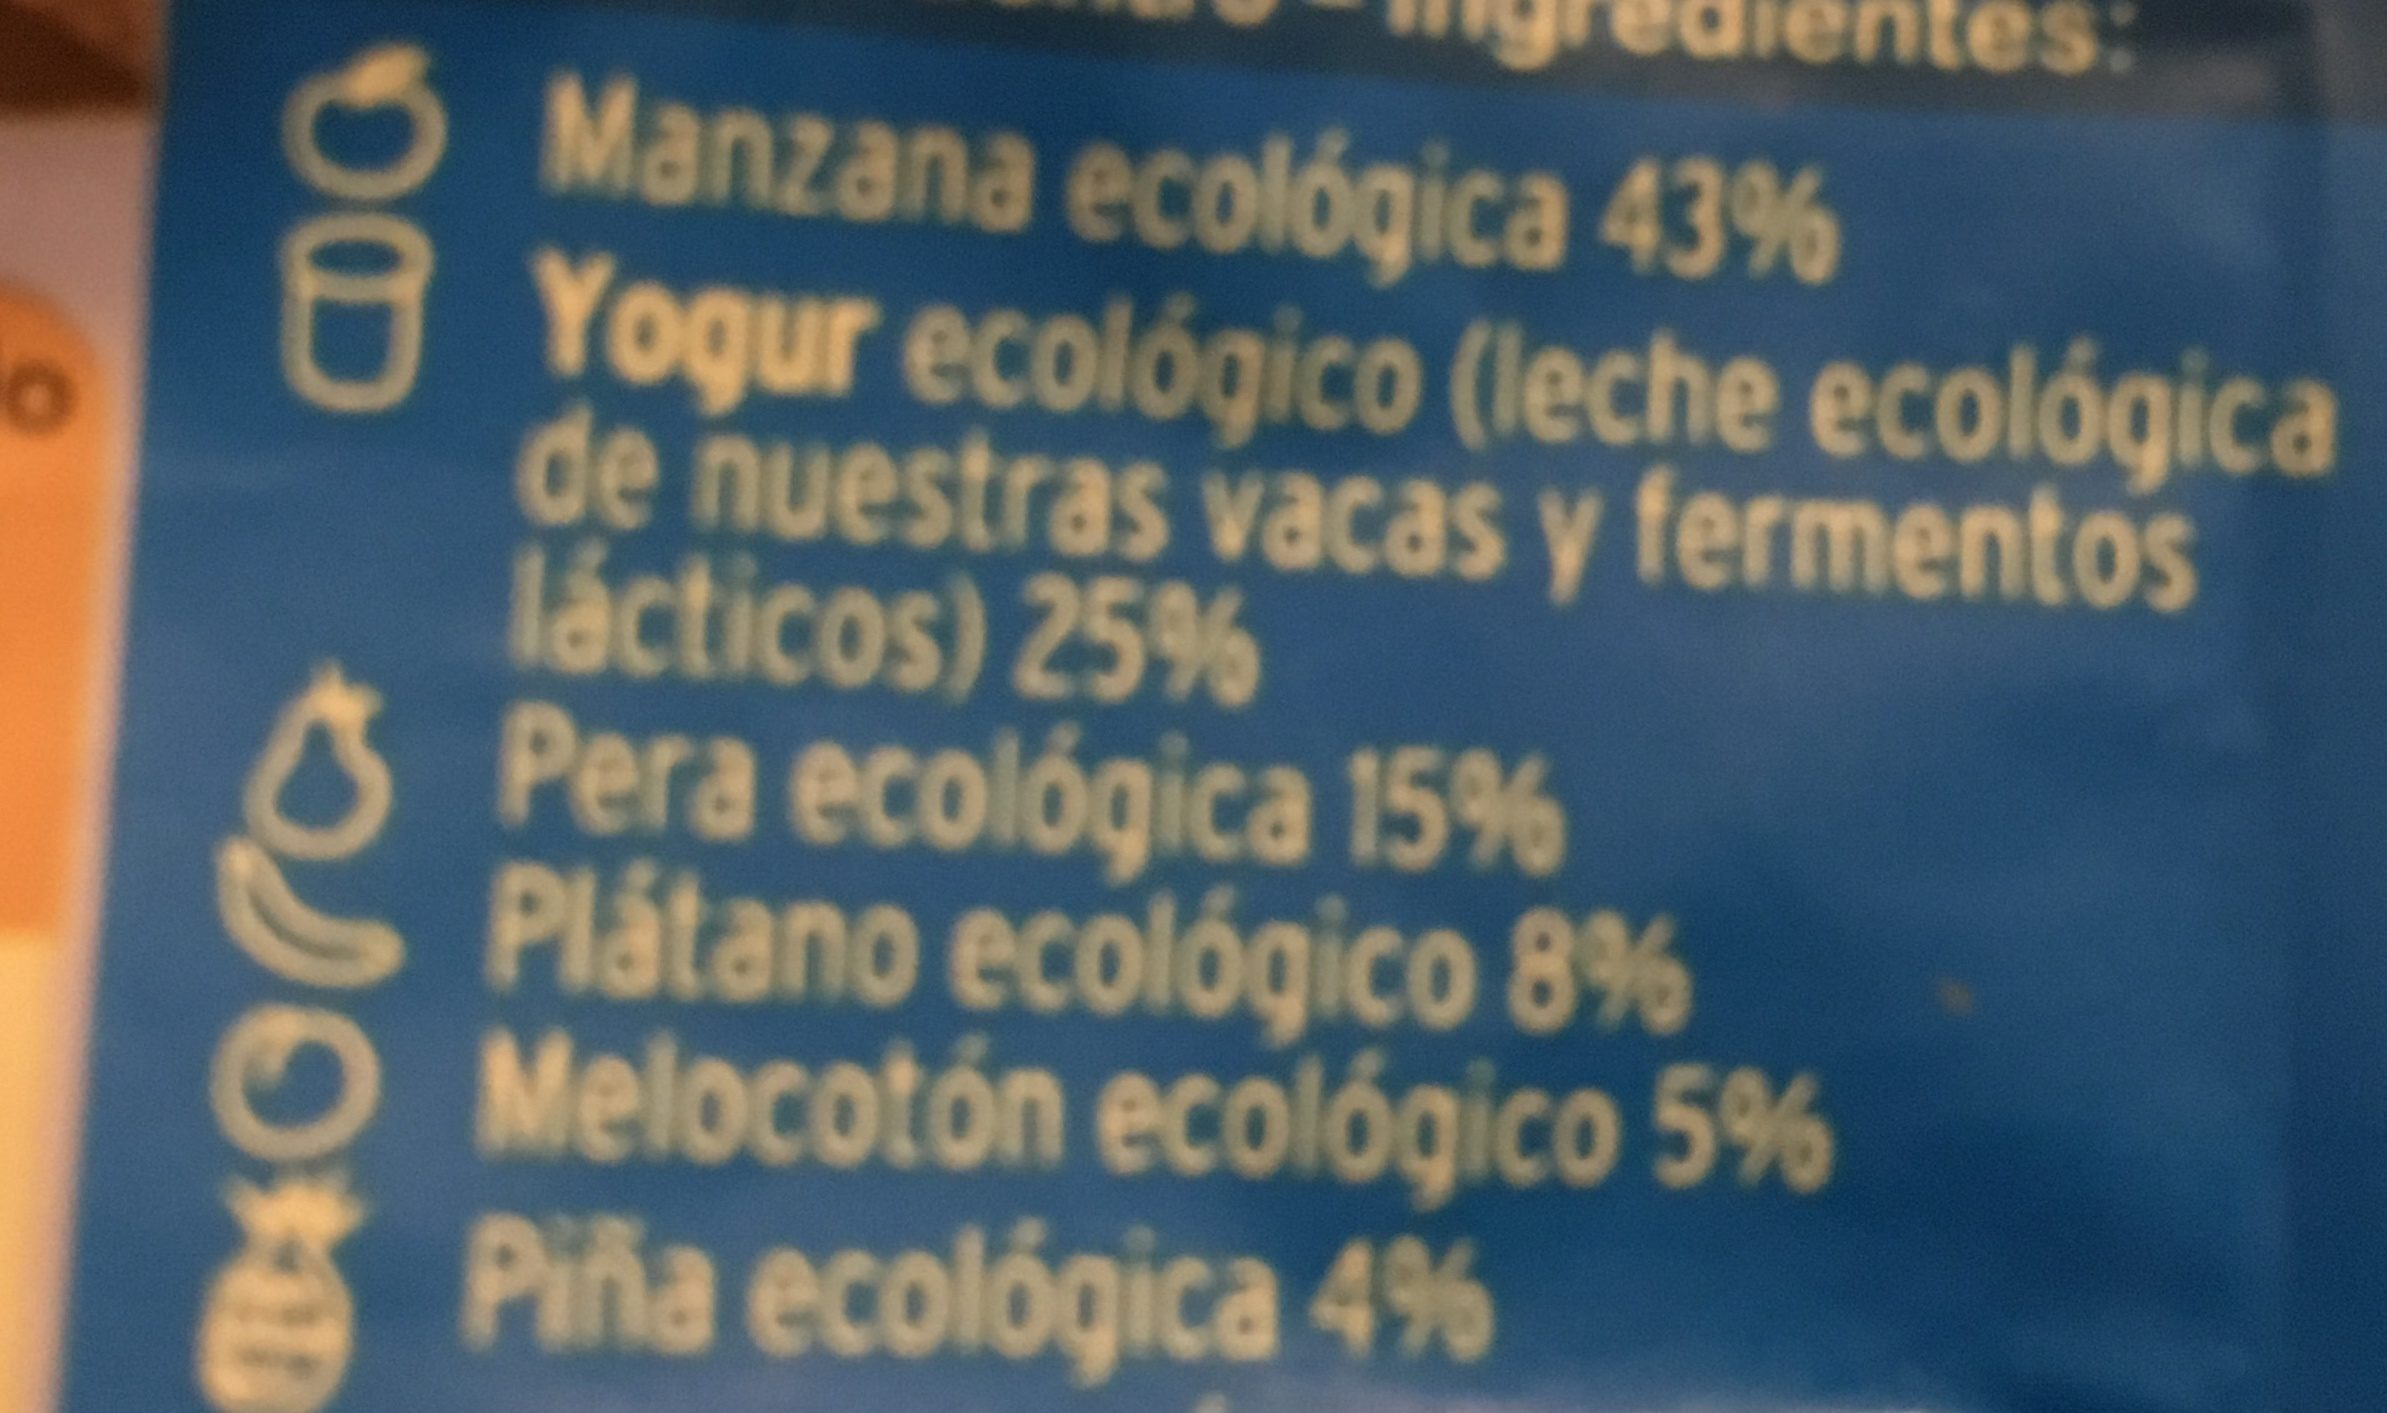 Multifrutas + Yogur Ecológico - Ingrédients